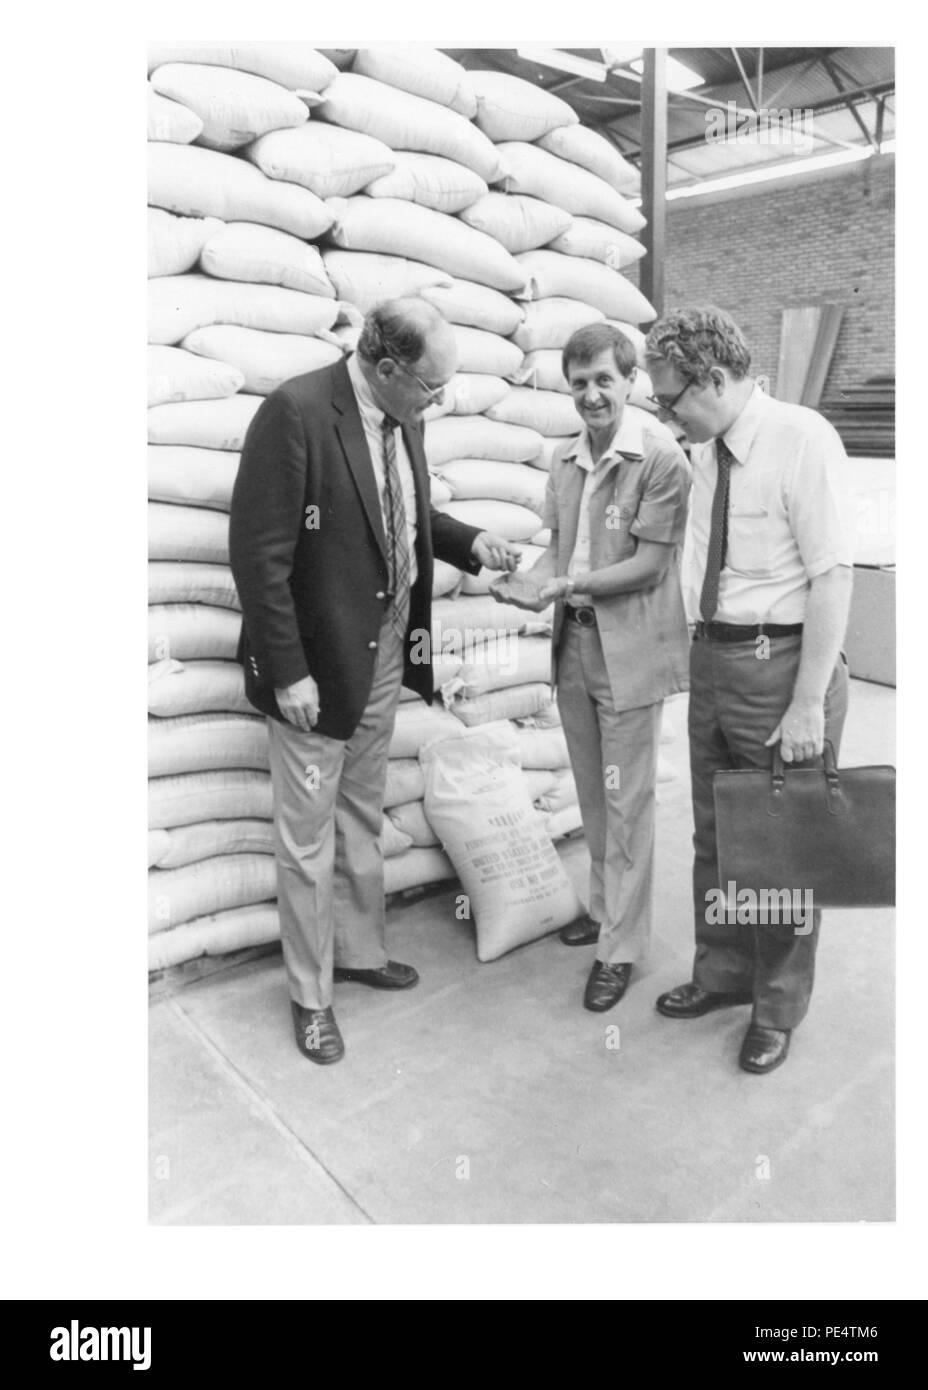 Food for Work in Rwanda - 1983 - American Ambassador John Blane and DCM Donald Hester examine USAID food stocked in ADRA warehouse in Kigali. - Stock Image